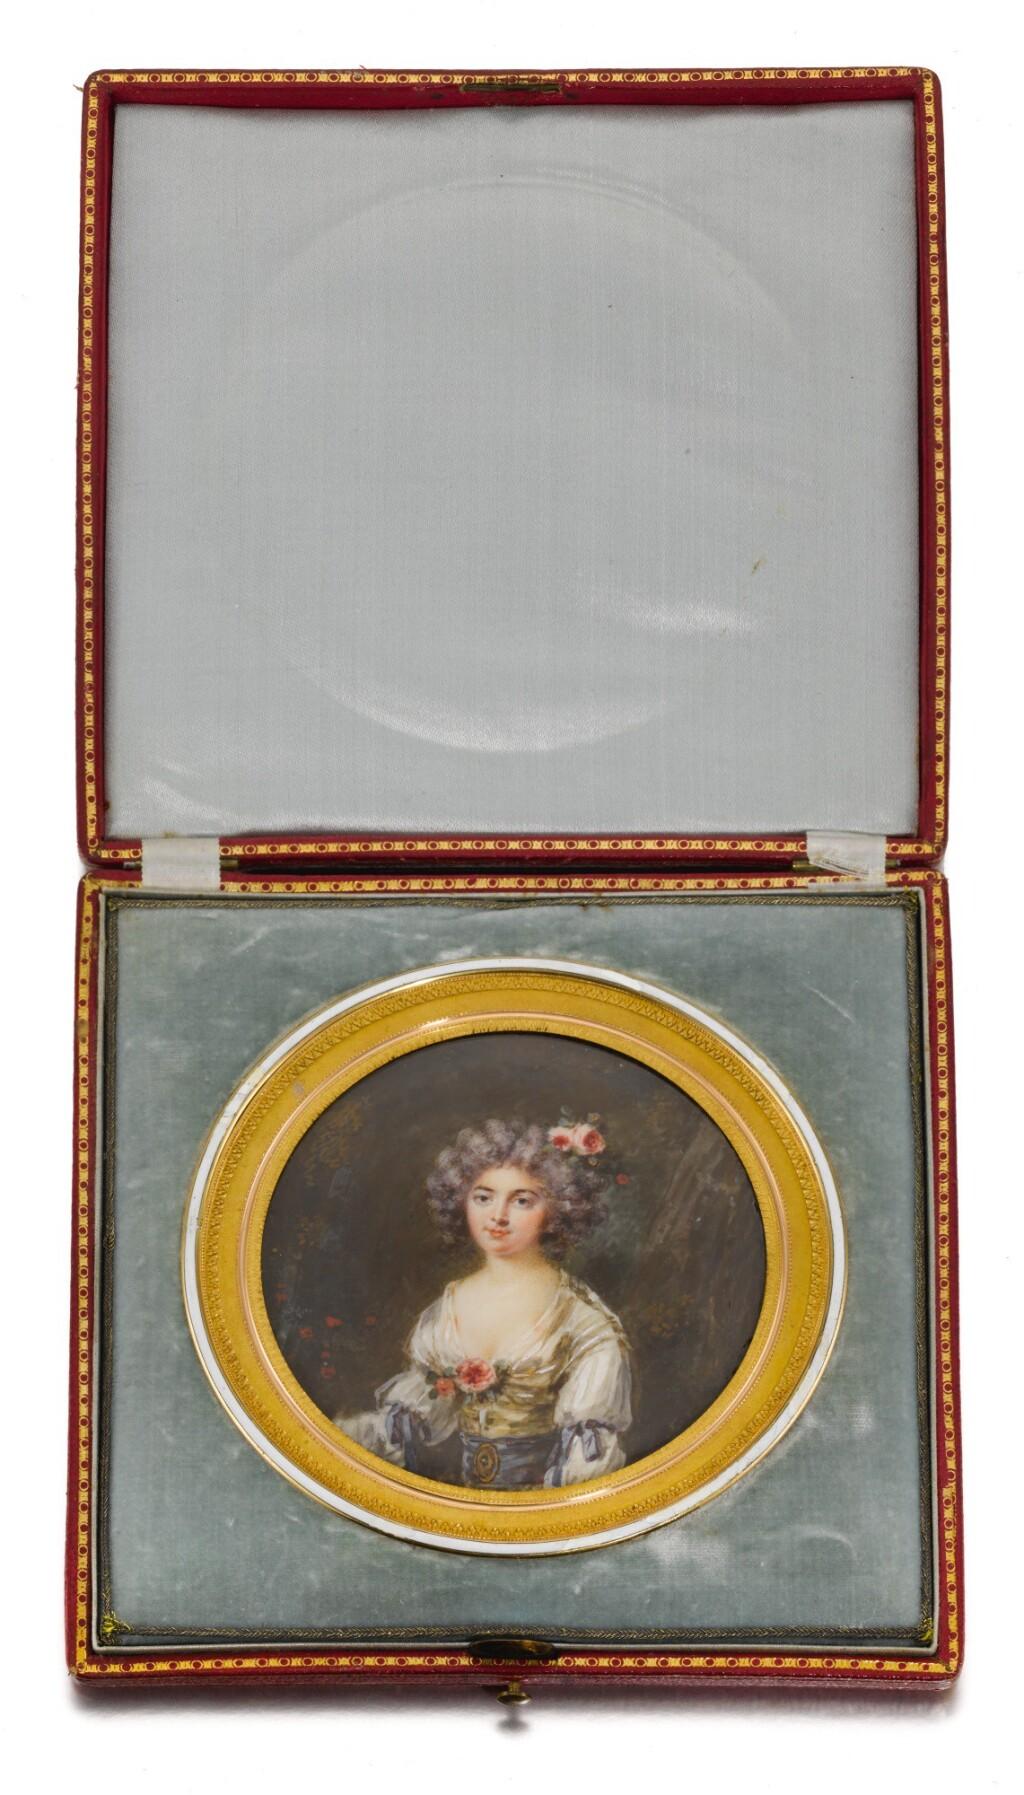 JOHN SMART | PORTRAIT OF LADY BOSTON, NÉE CHRISTIAN METHUEN (1750-1832)